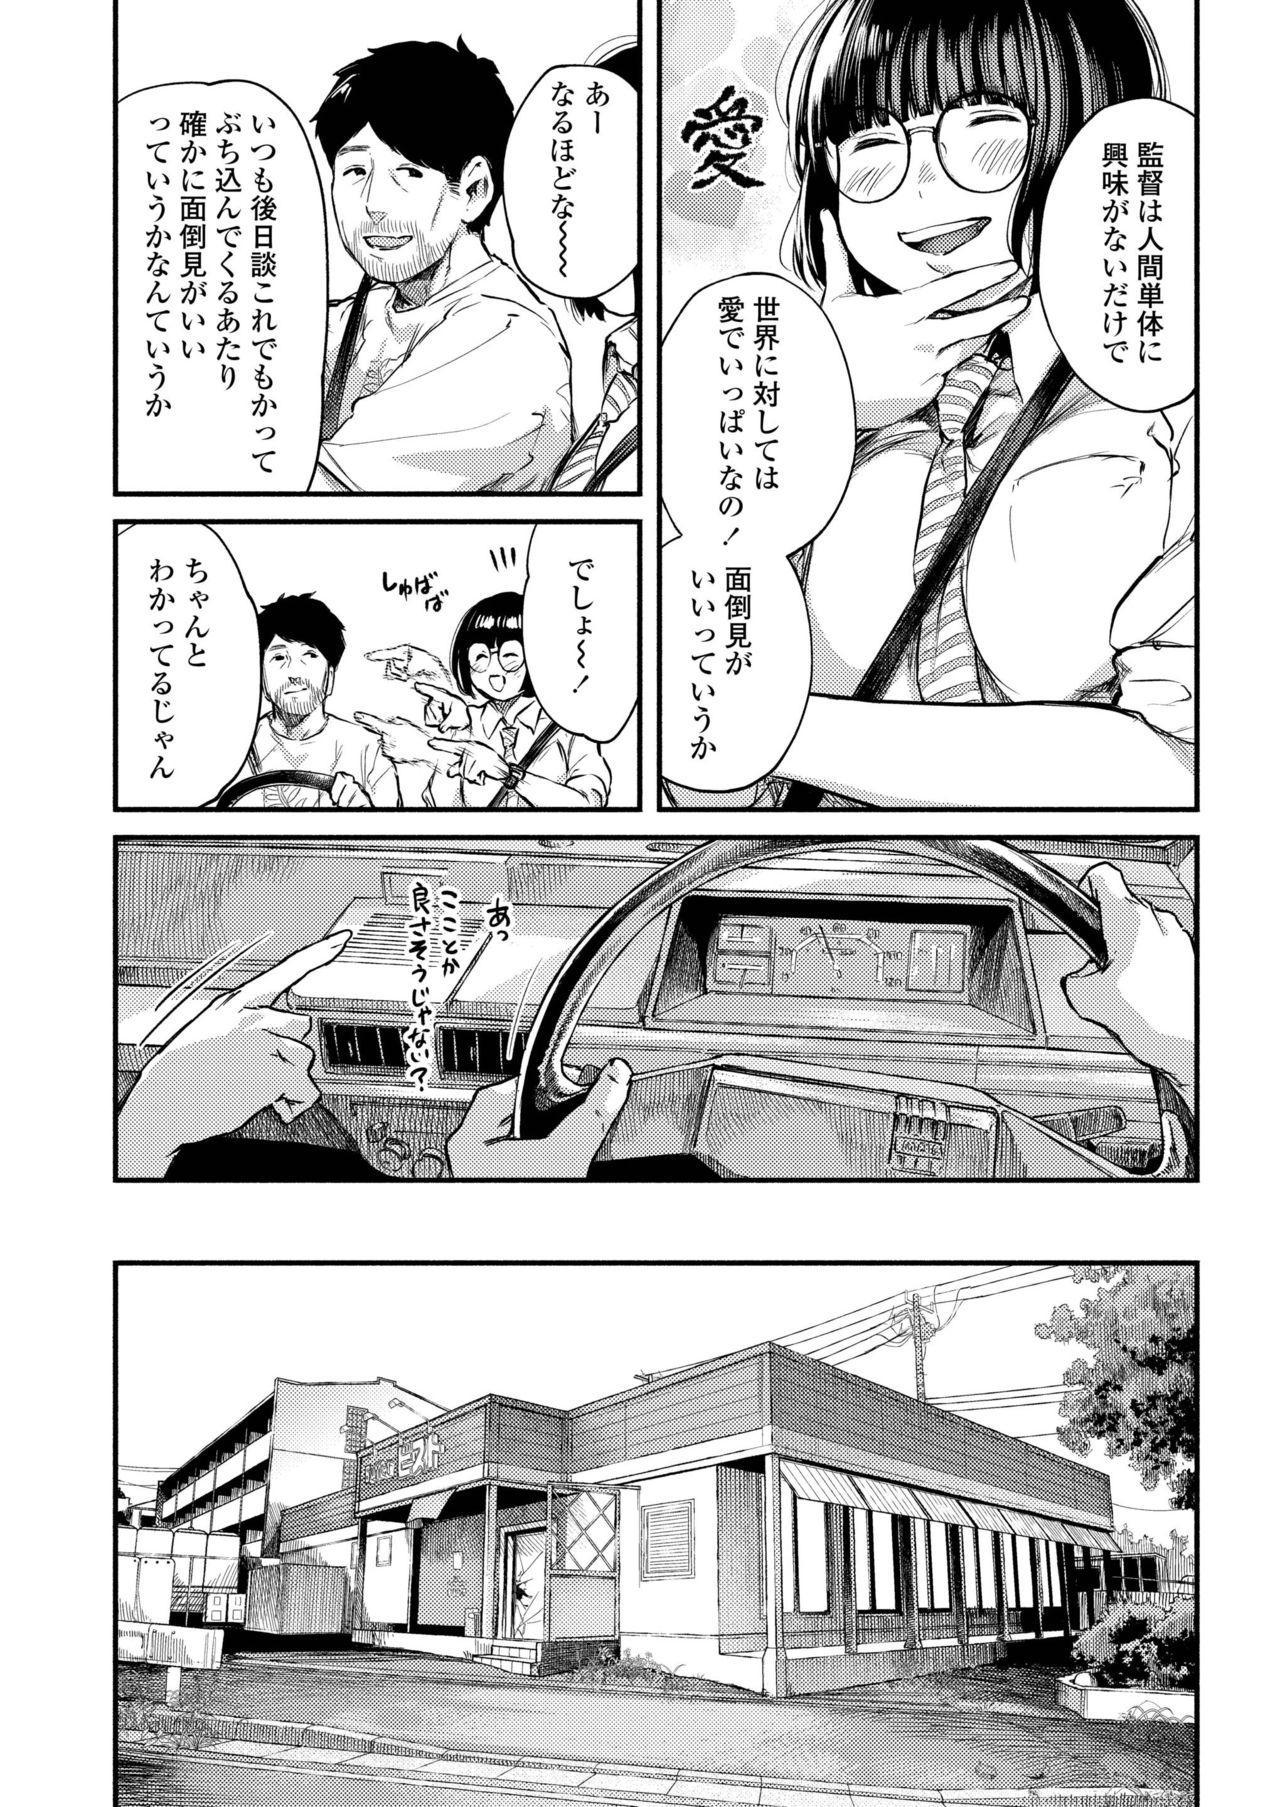 COMIC AOHA 2019 Haru 299